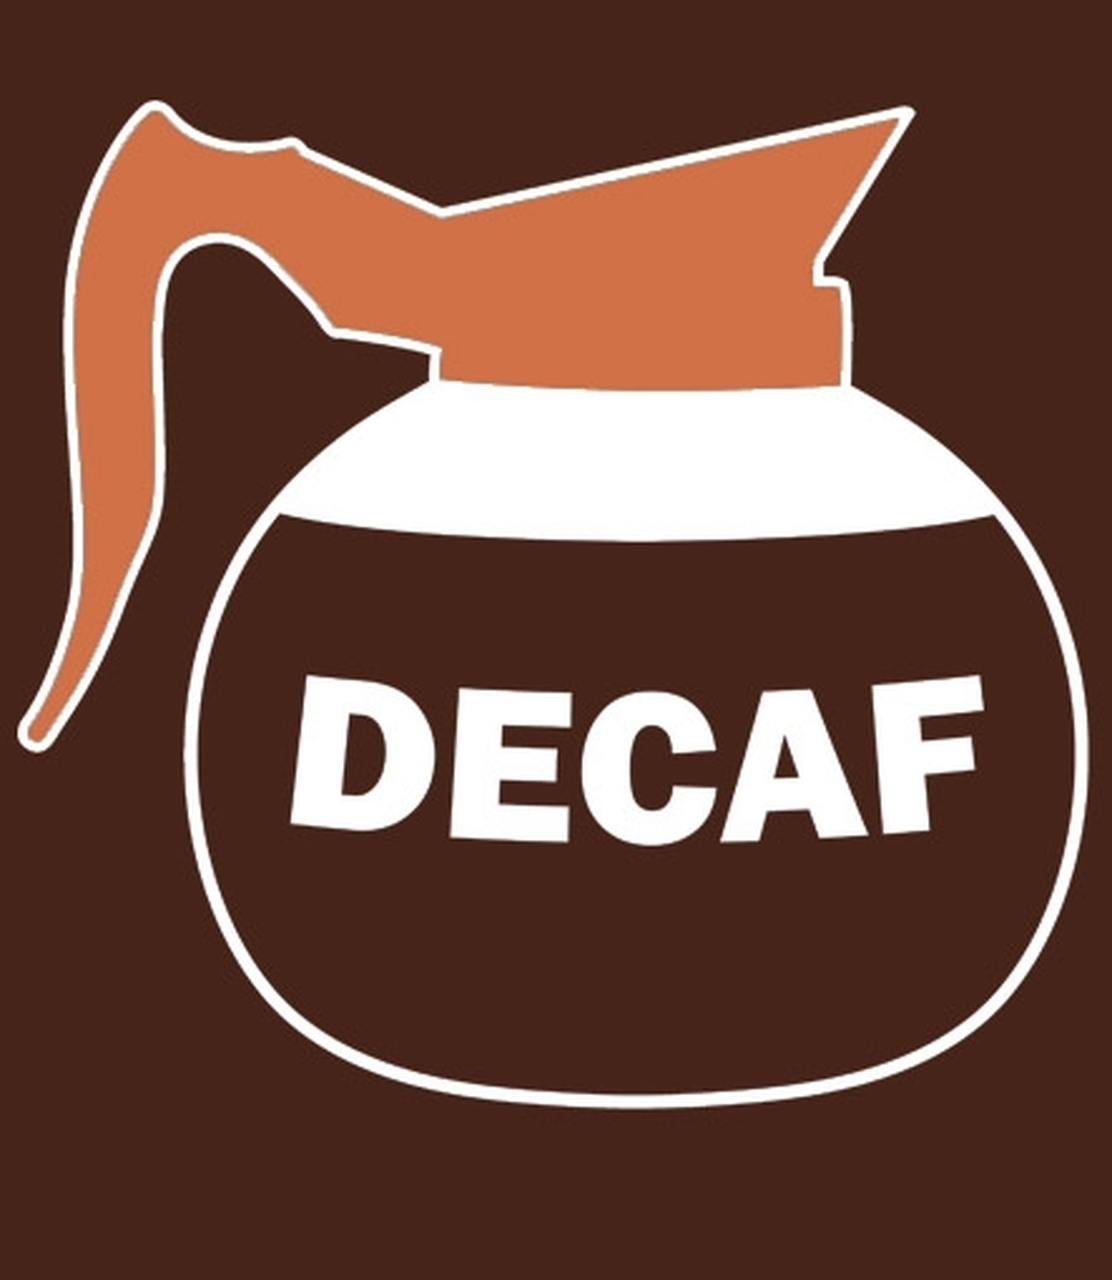 Coffee clipart decaf coffee.  pound bag espresso